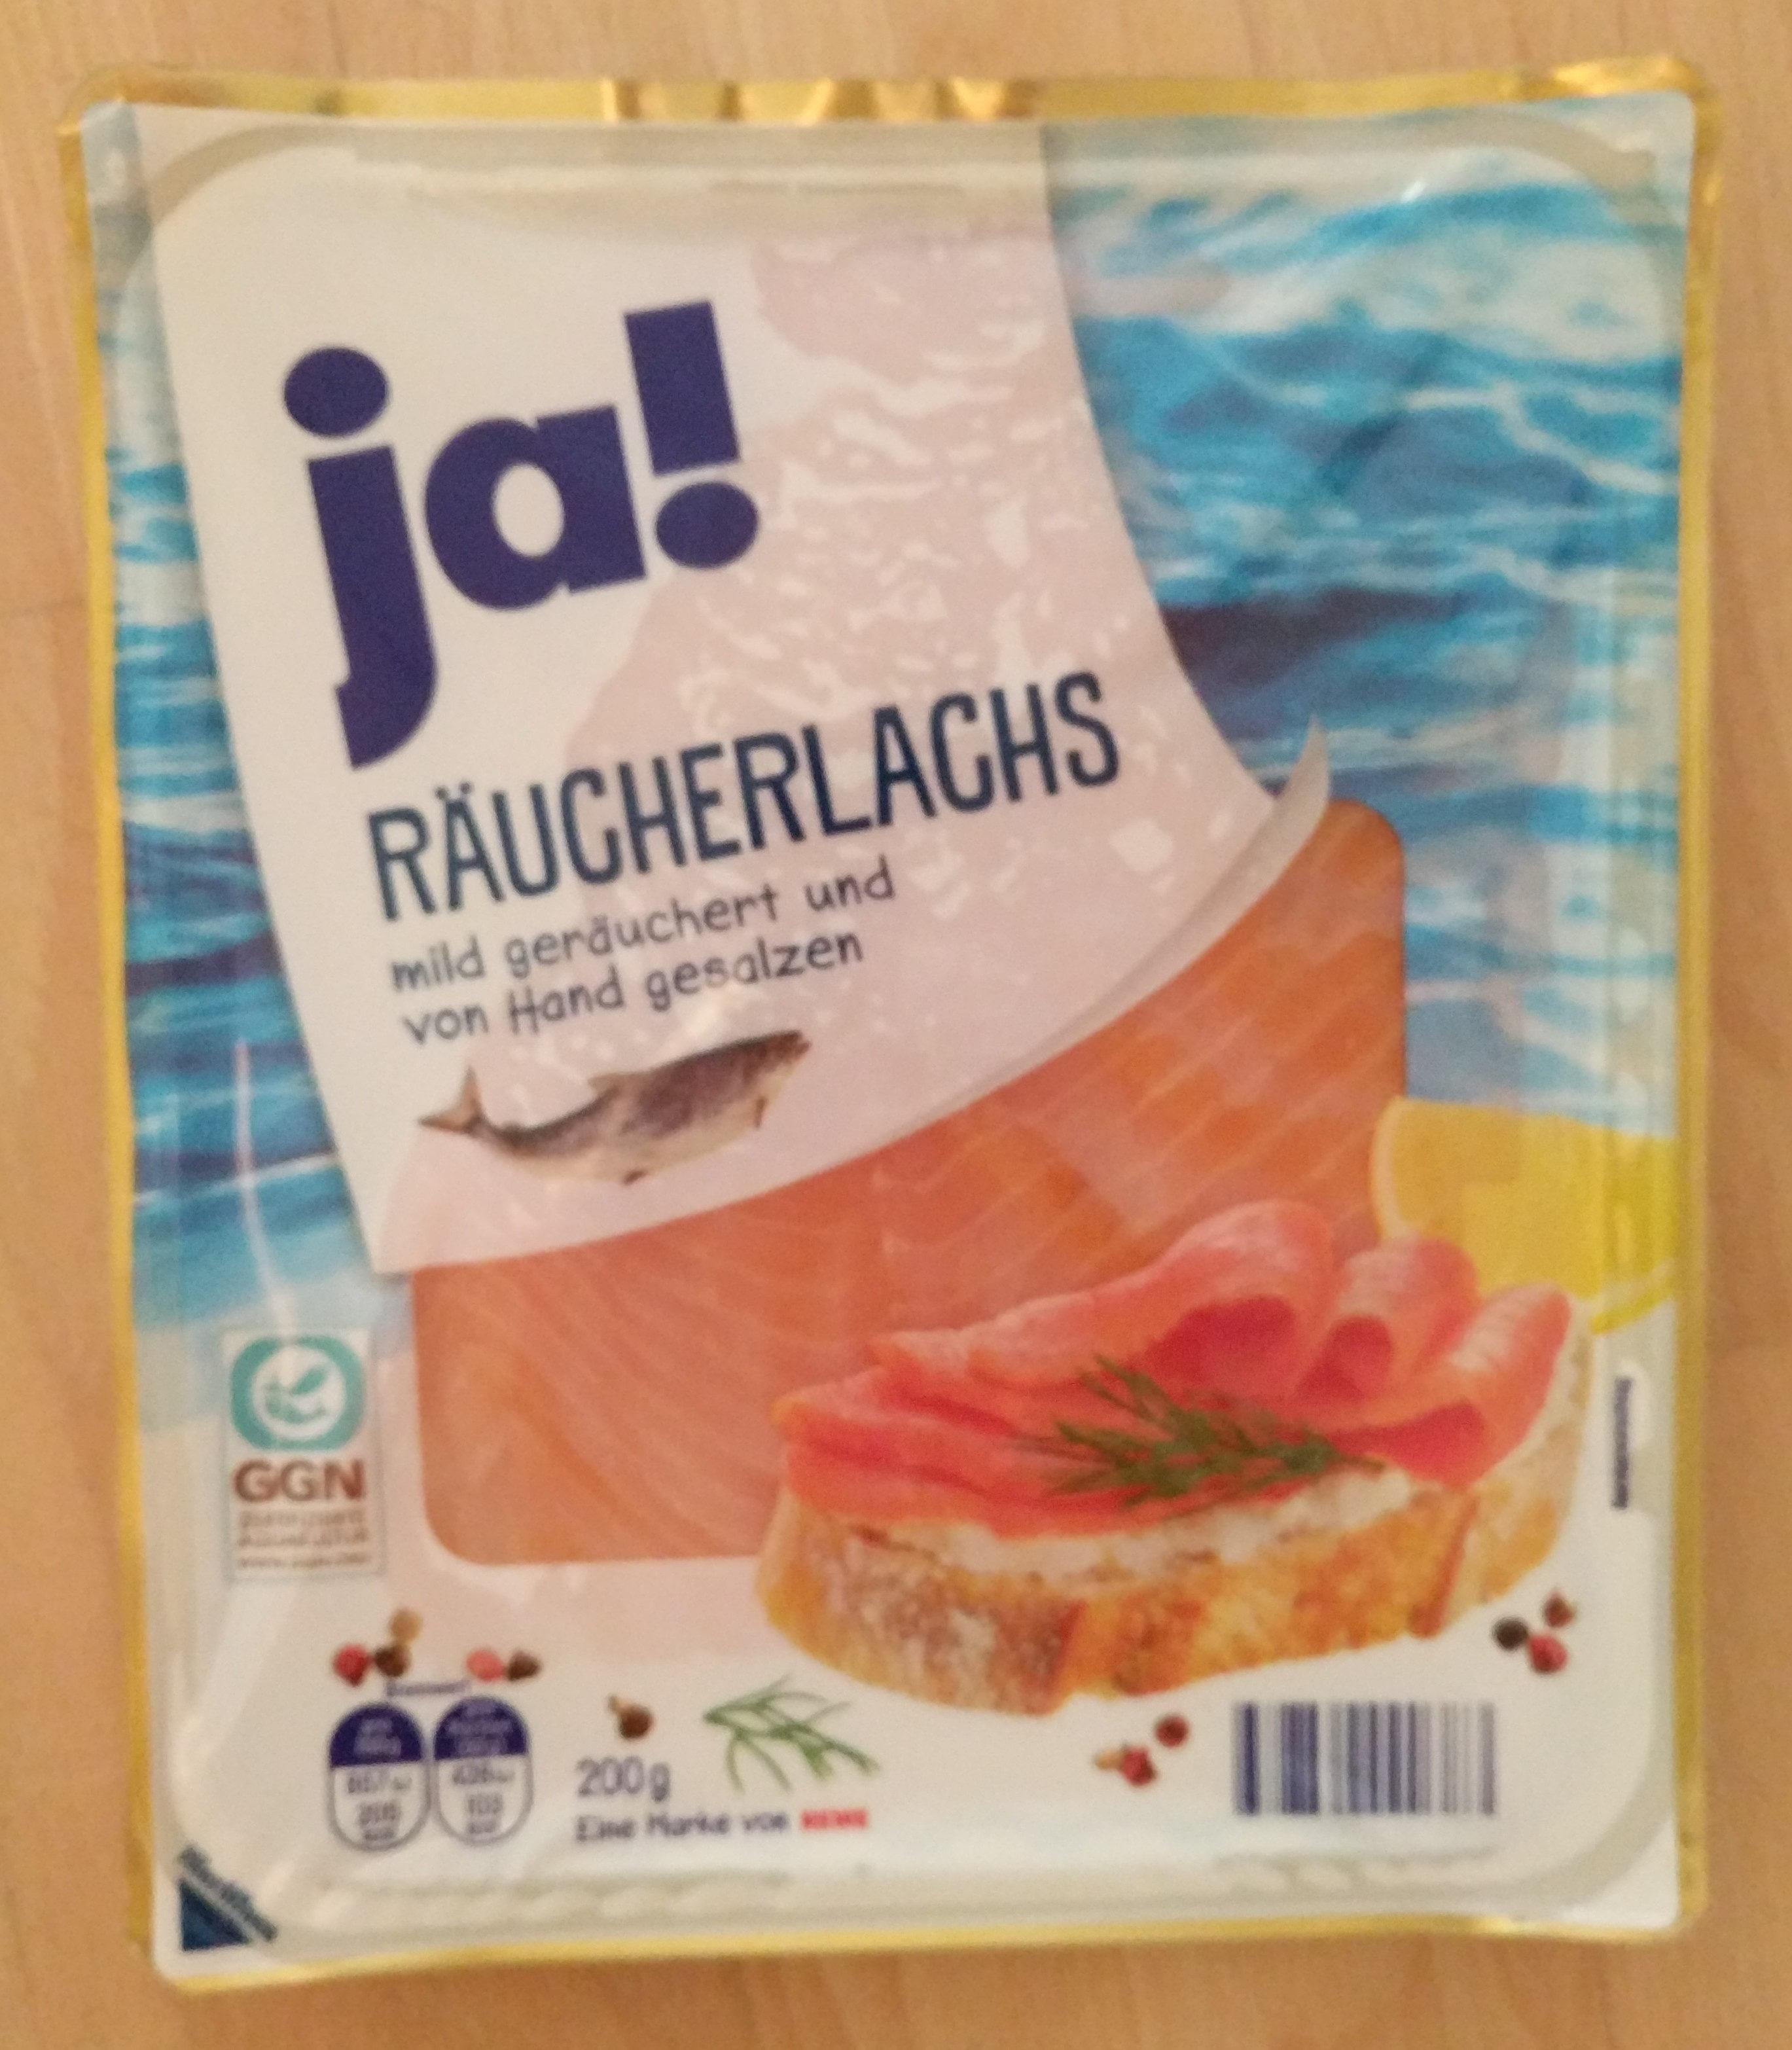 Räucherlach - Product - en